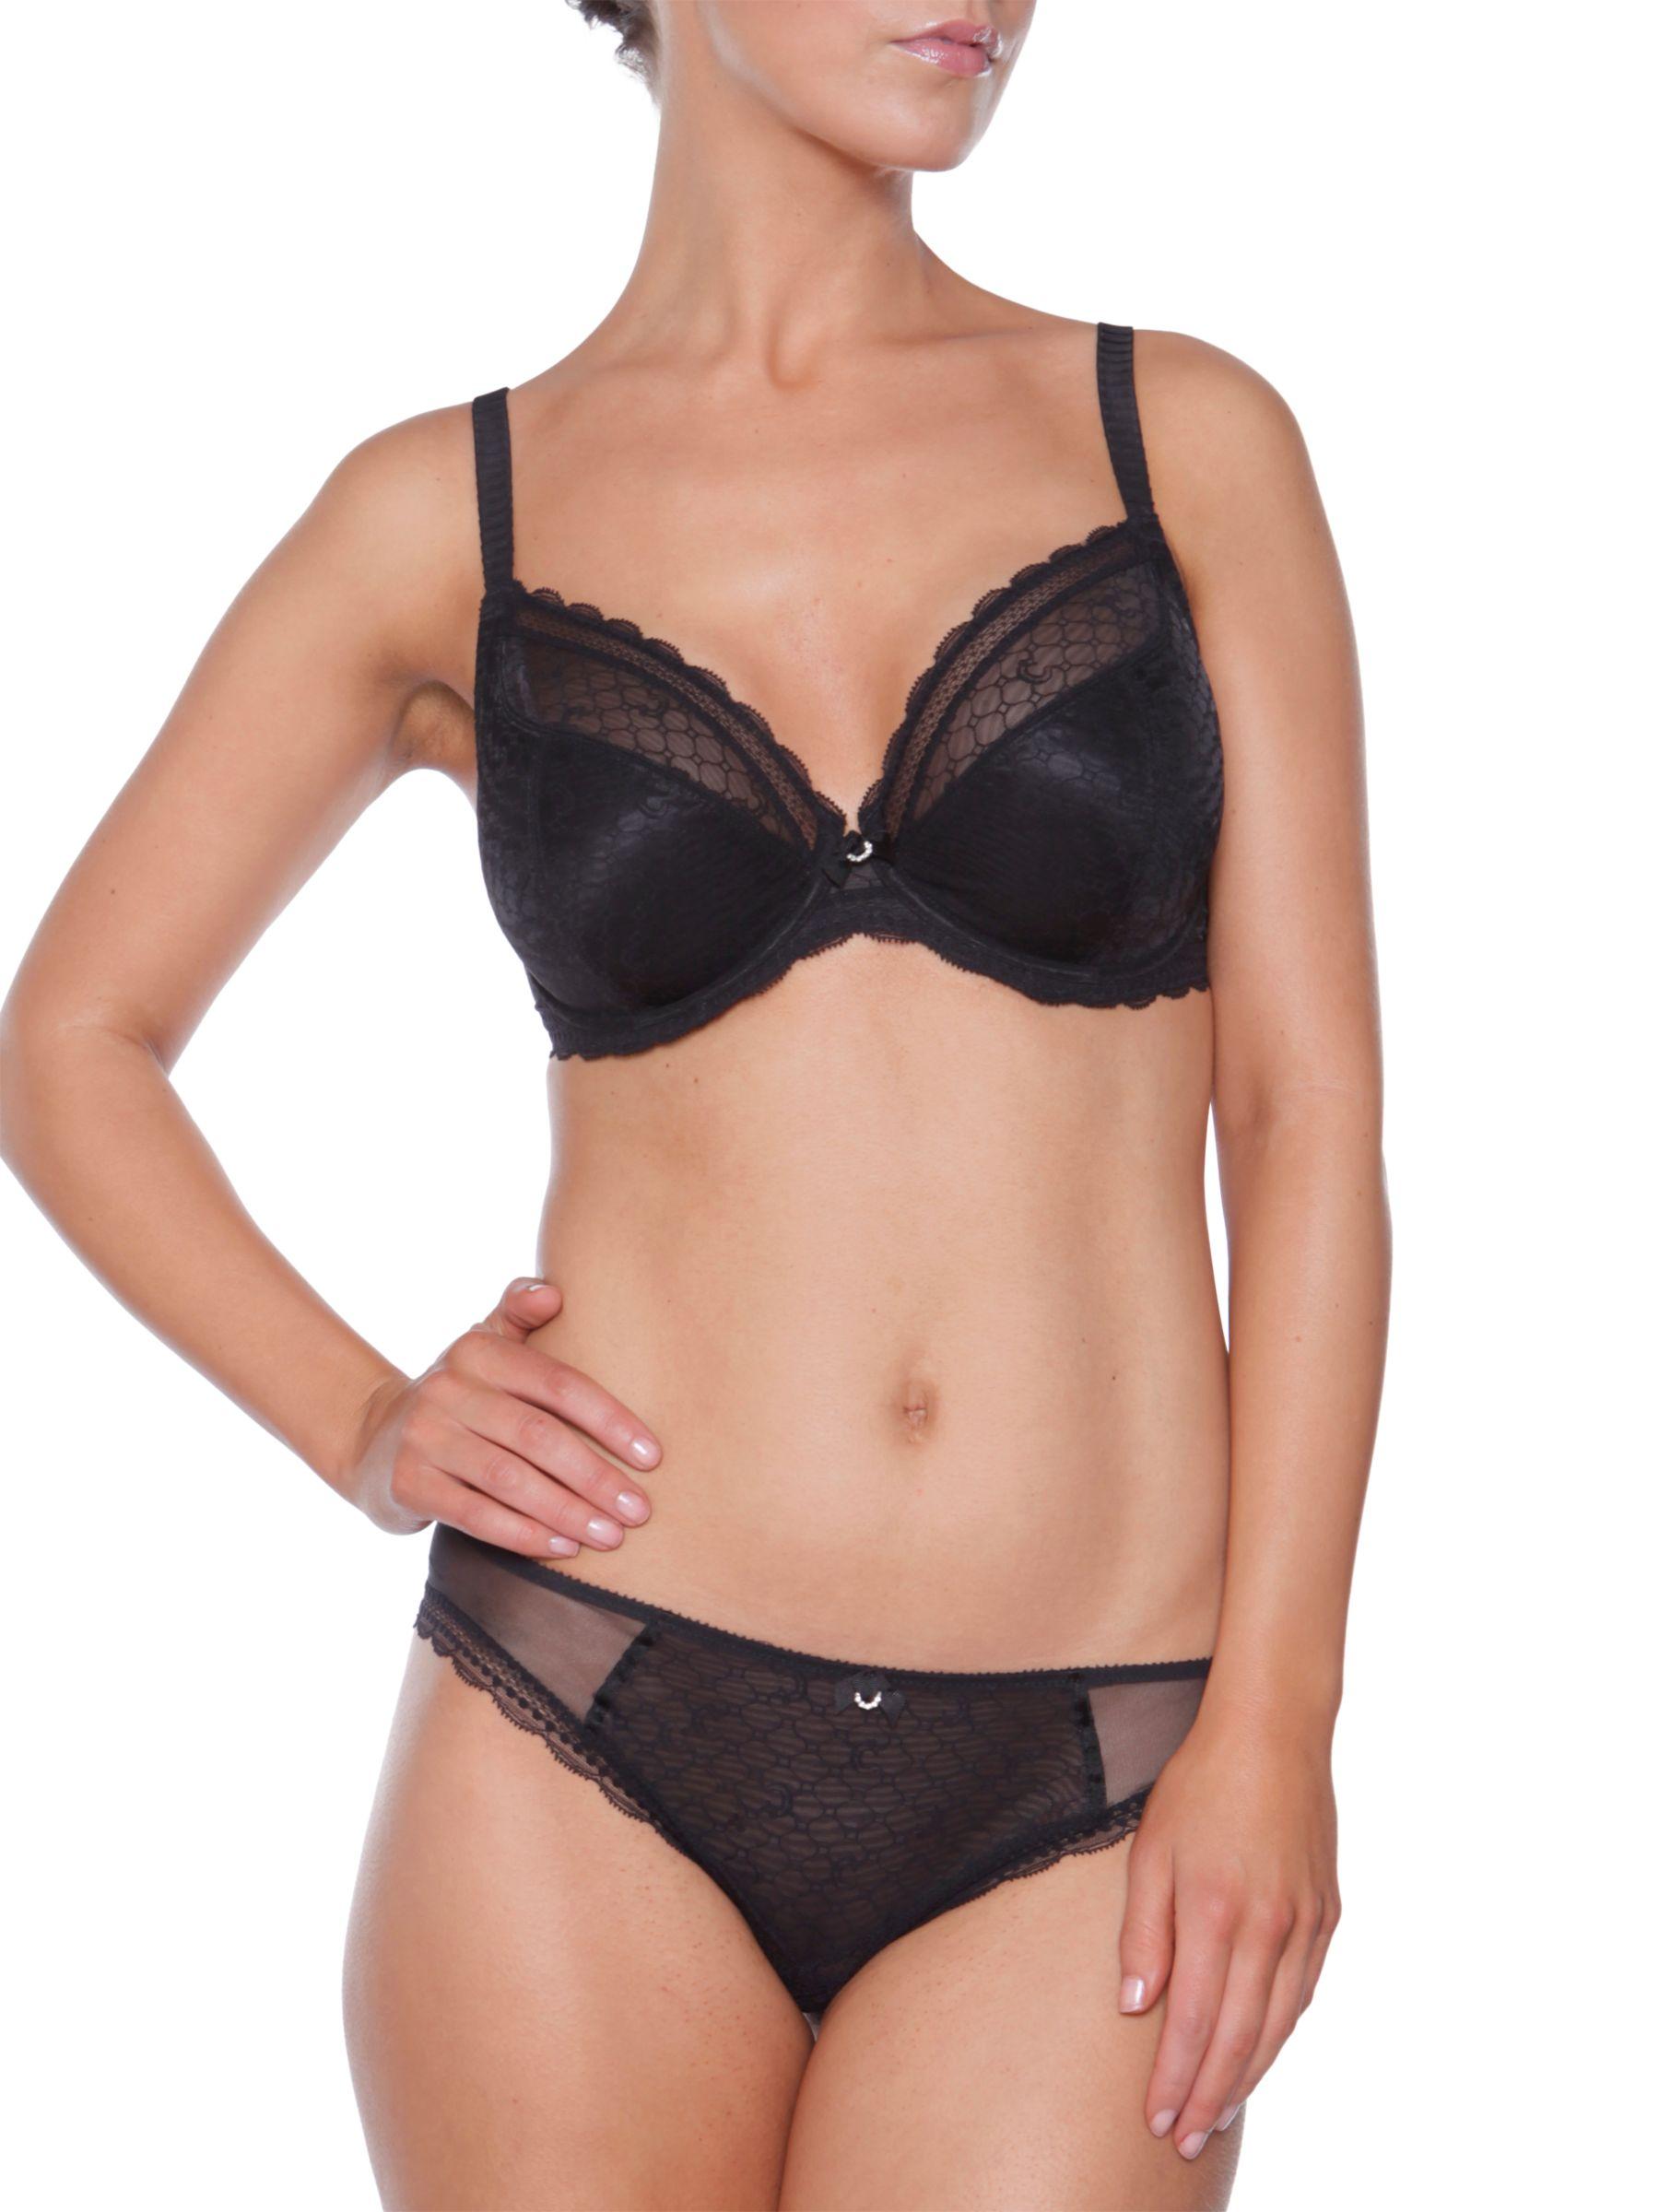 Chantelle C Chic Sexy Plunge Bra, Black